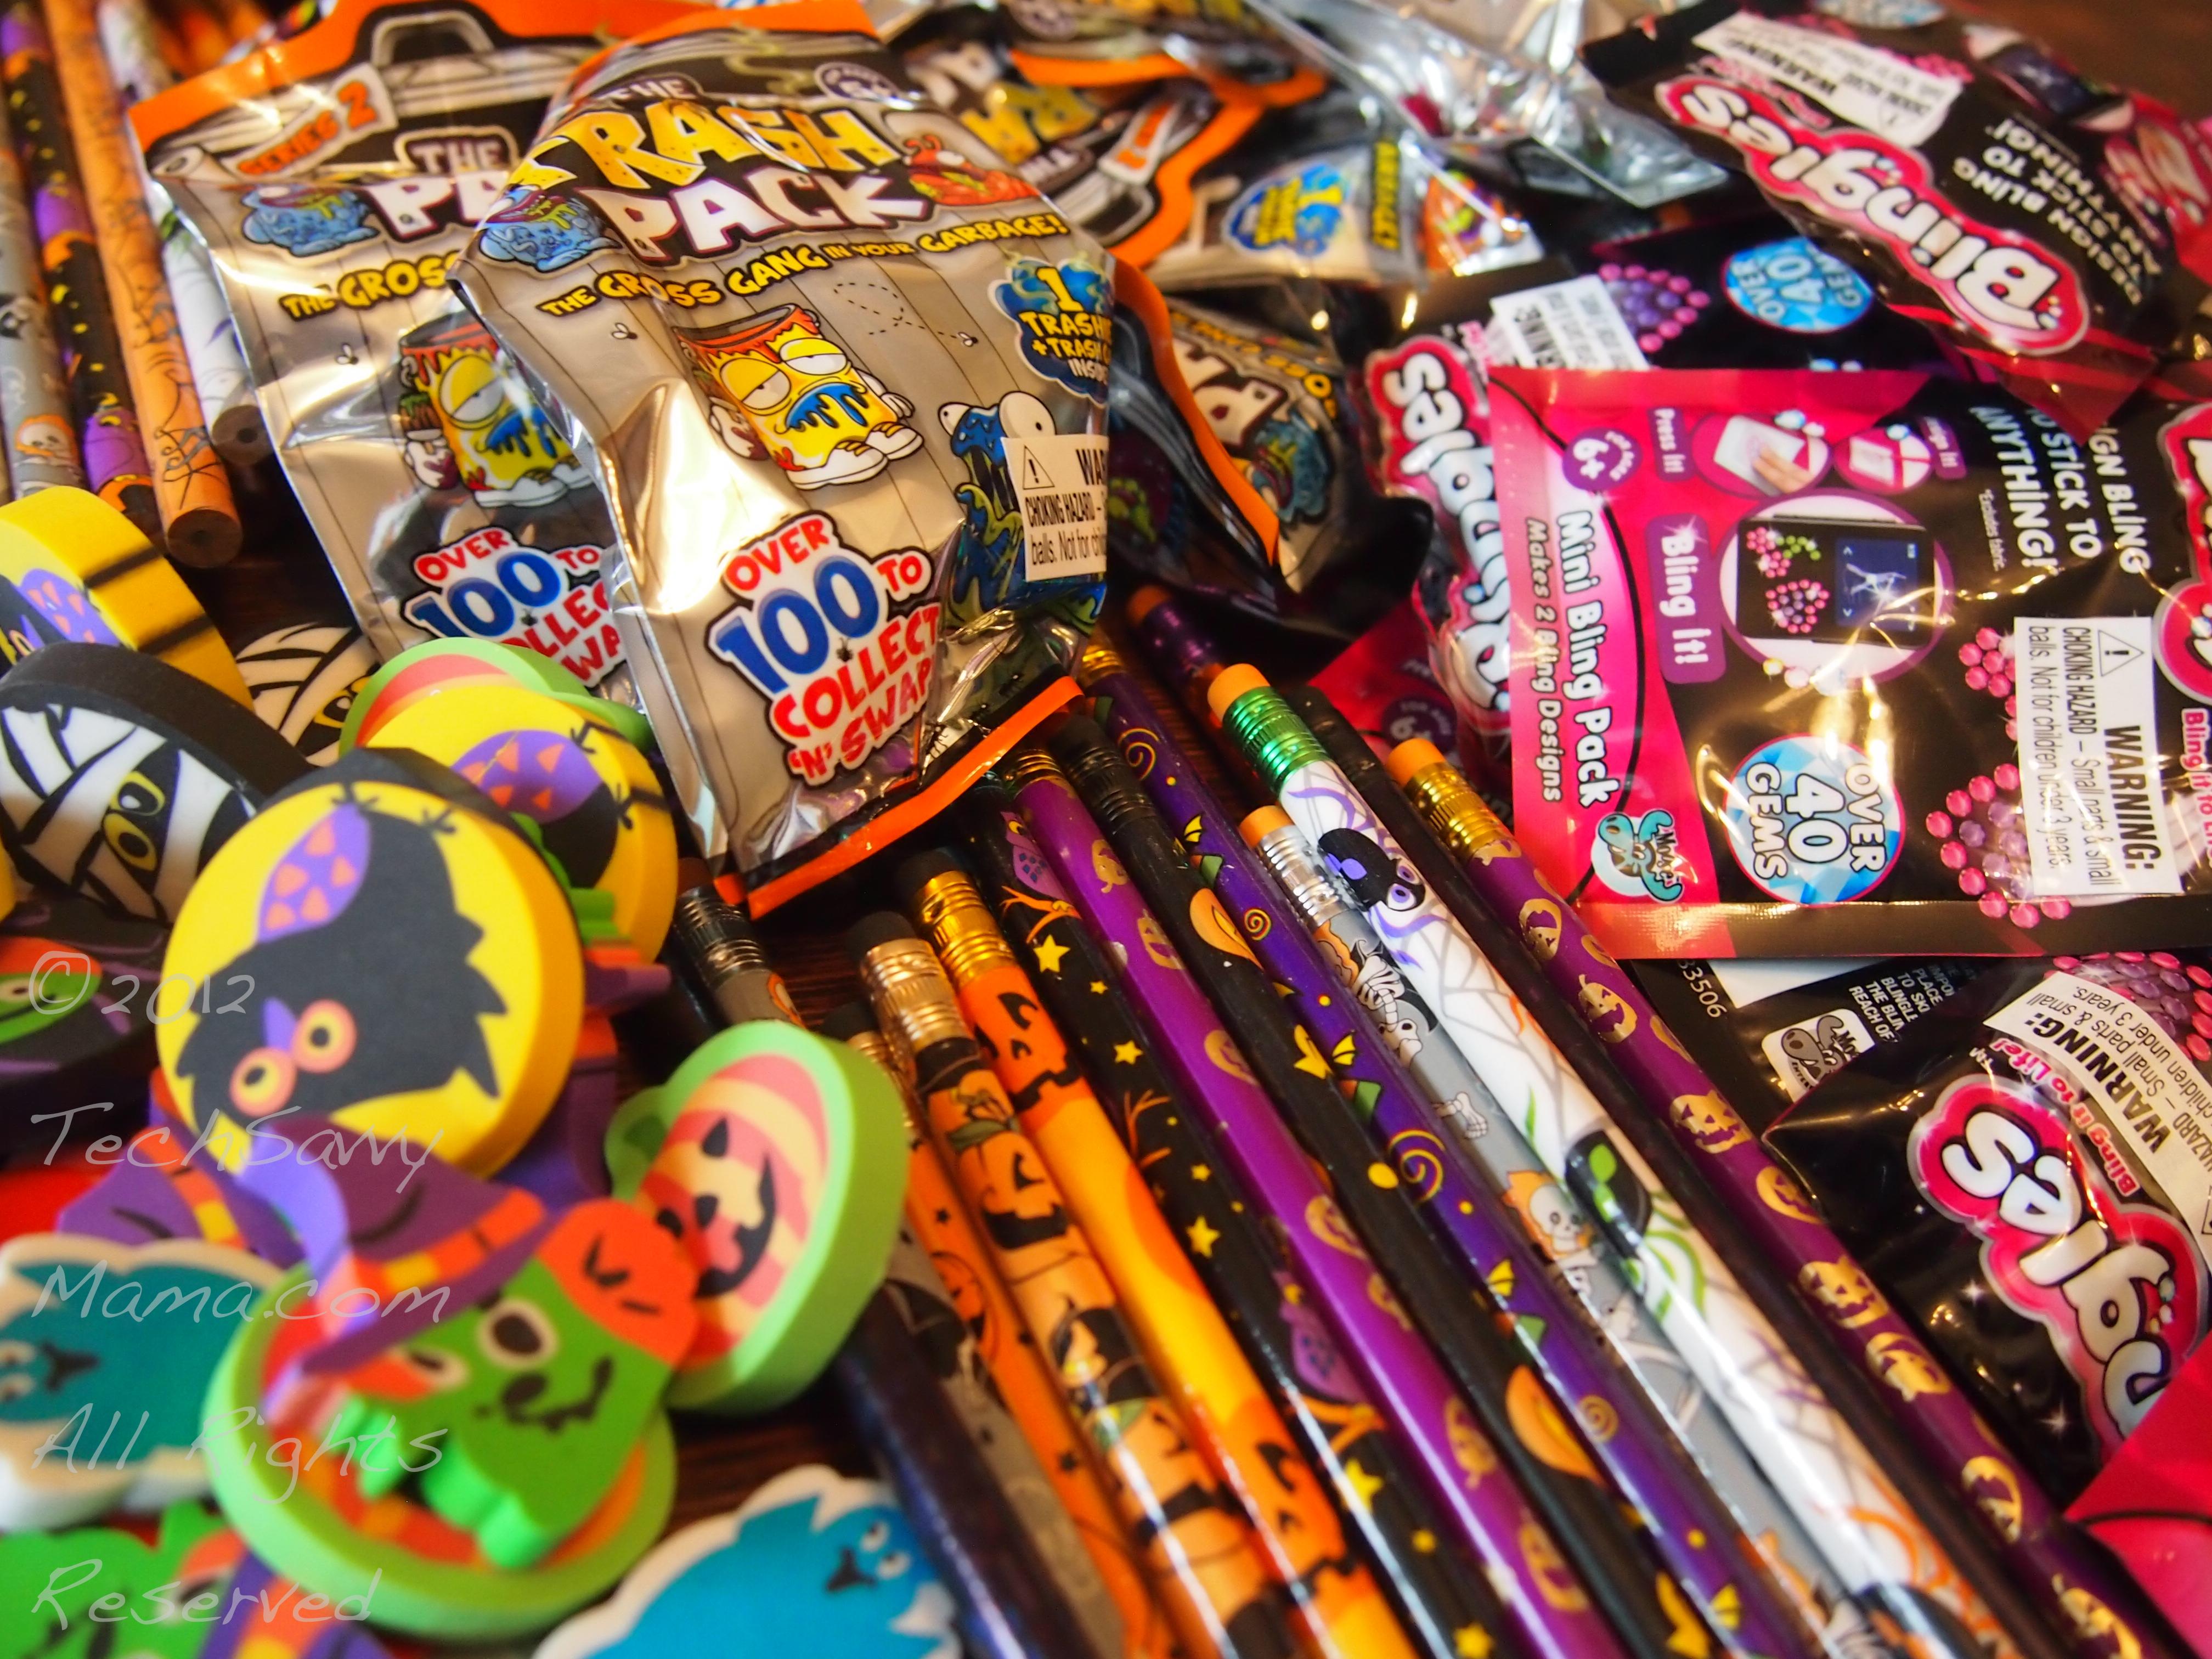 non-candy treats for class halloween treat bags - tech savvy mama